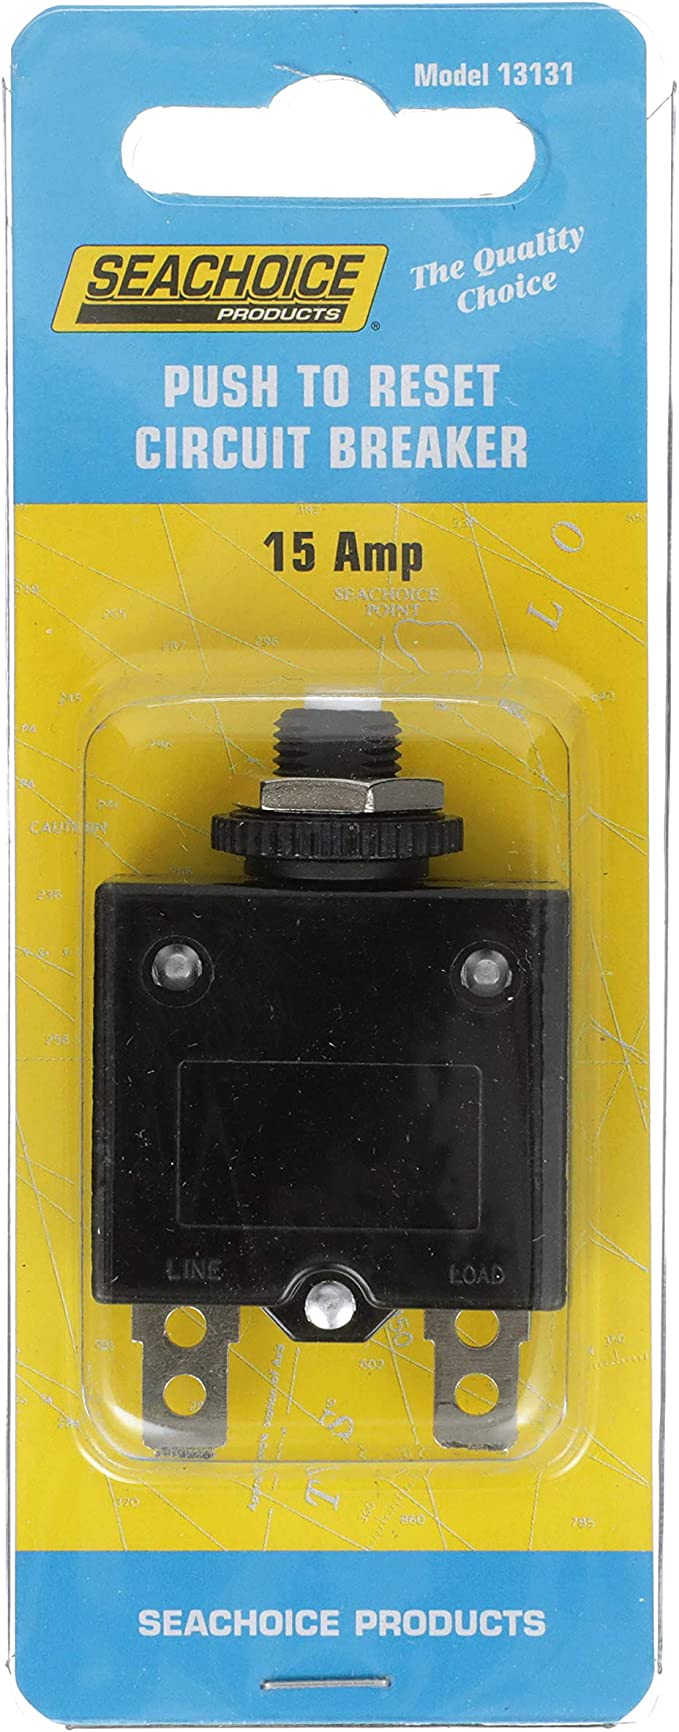 Sierra CB41220 Push Button Circuit Breaker 15 Amp 4419 for sale online